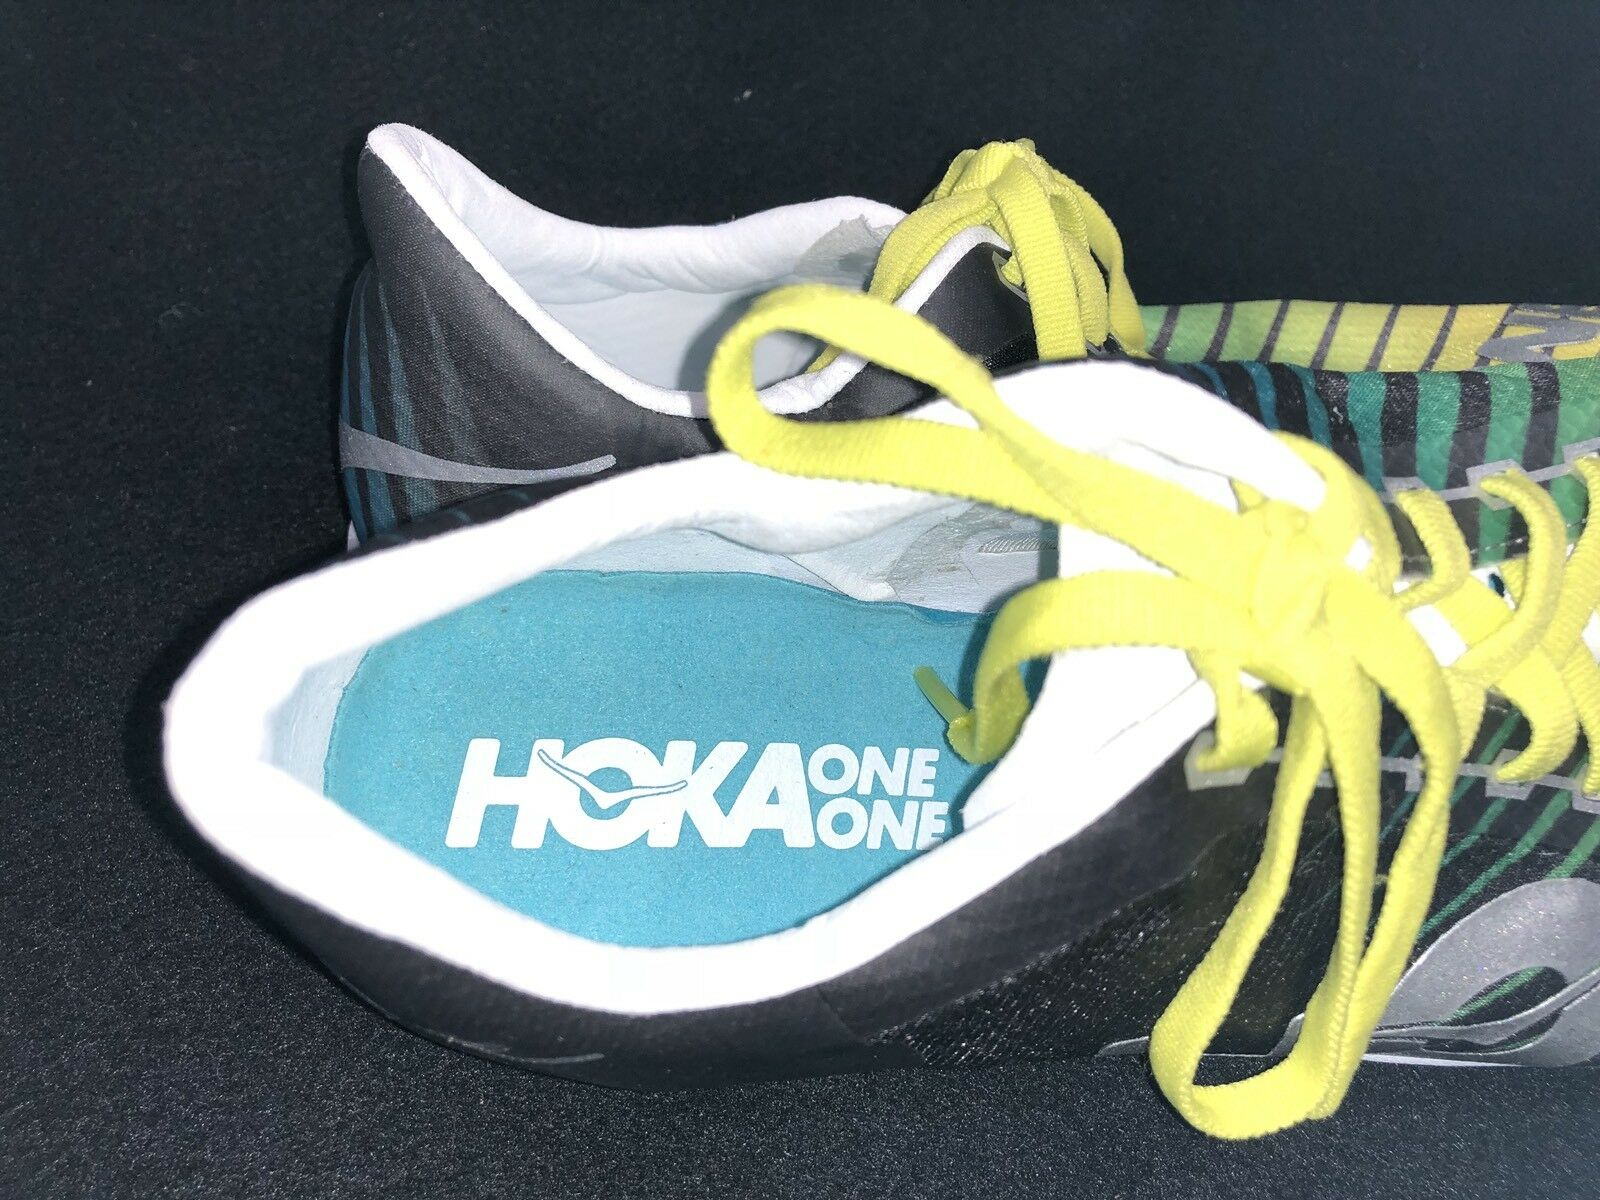 Hoka One One Speed Evo R Running Rio  Uomo Schuhes Running R Track Yellow Grün Silver Grau e19c36